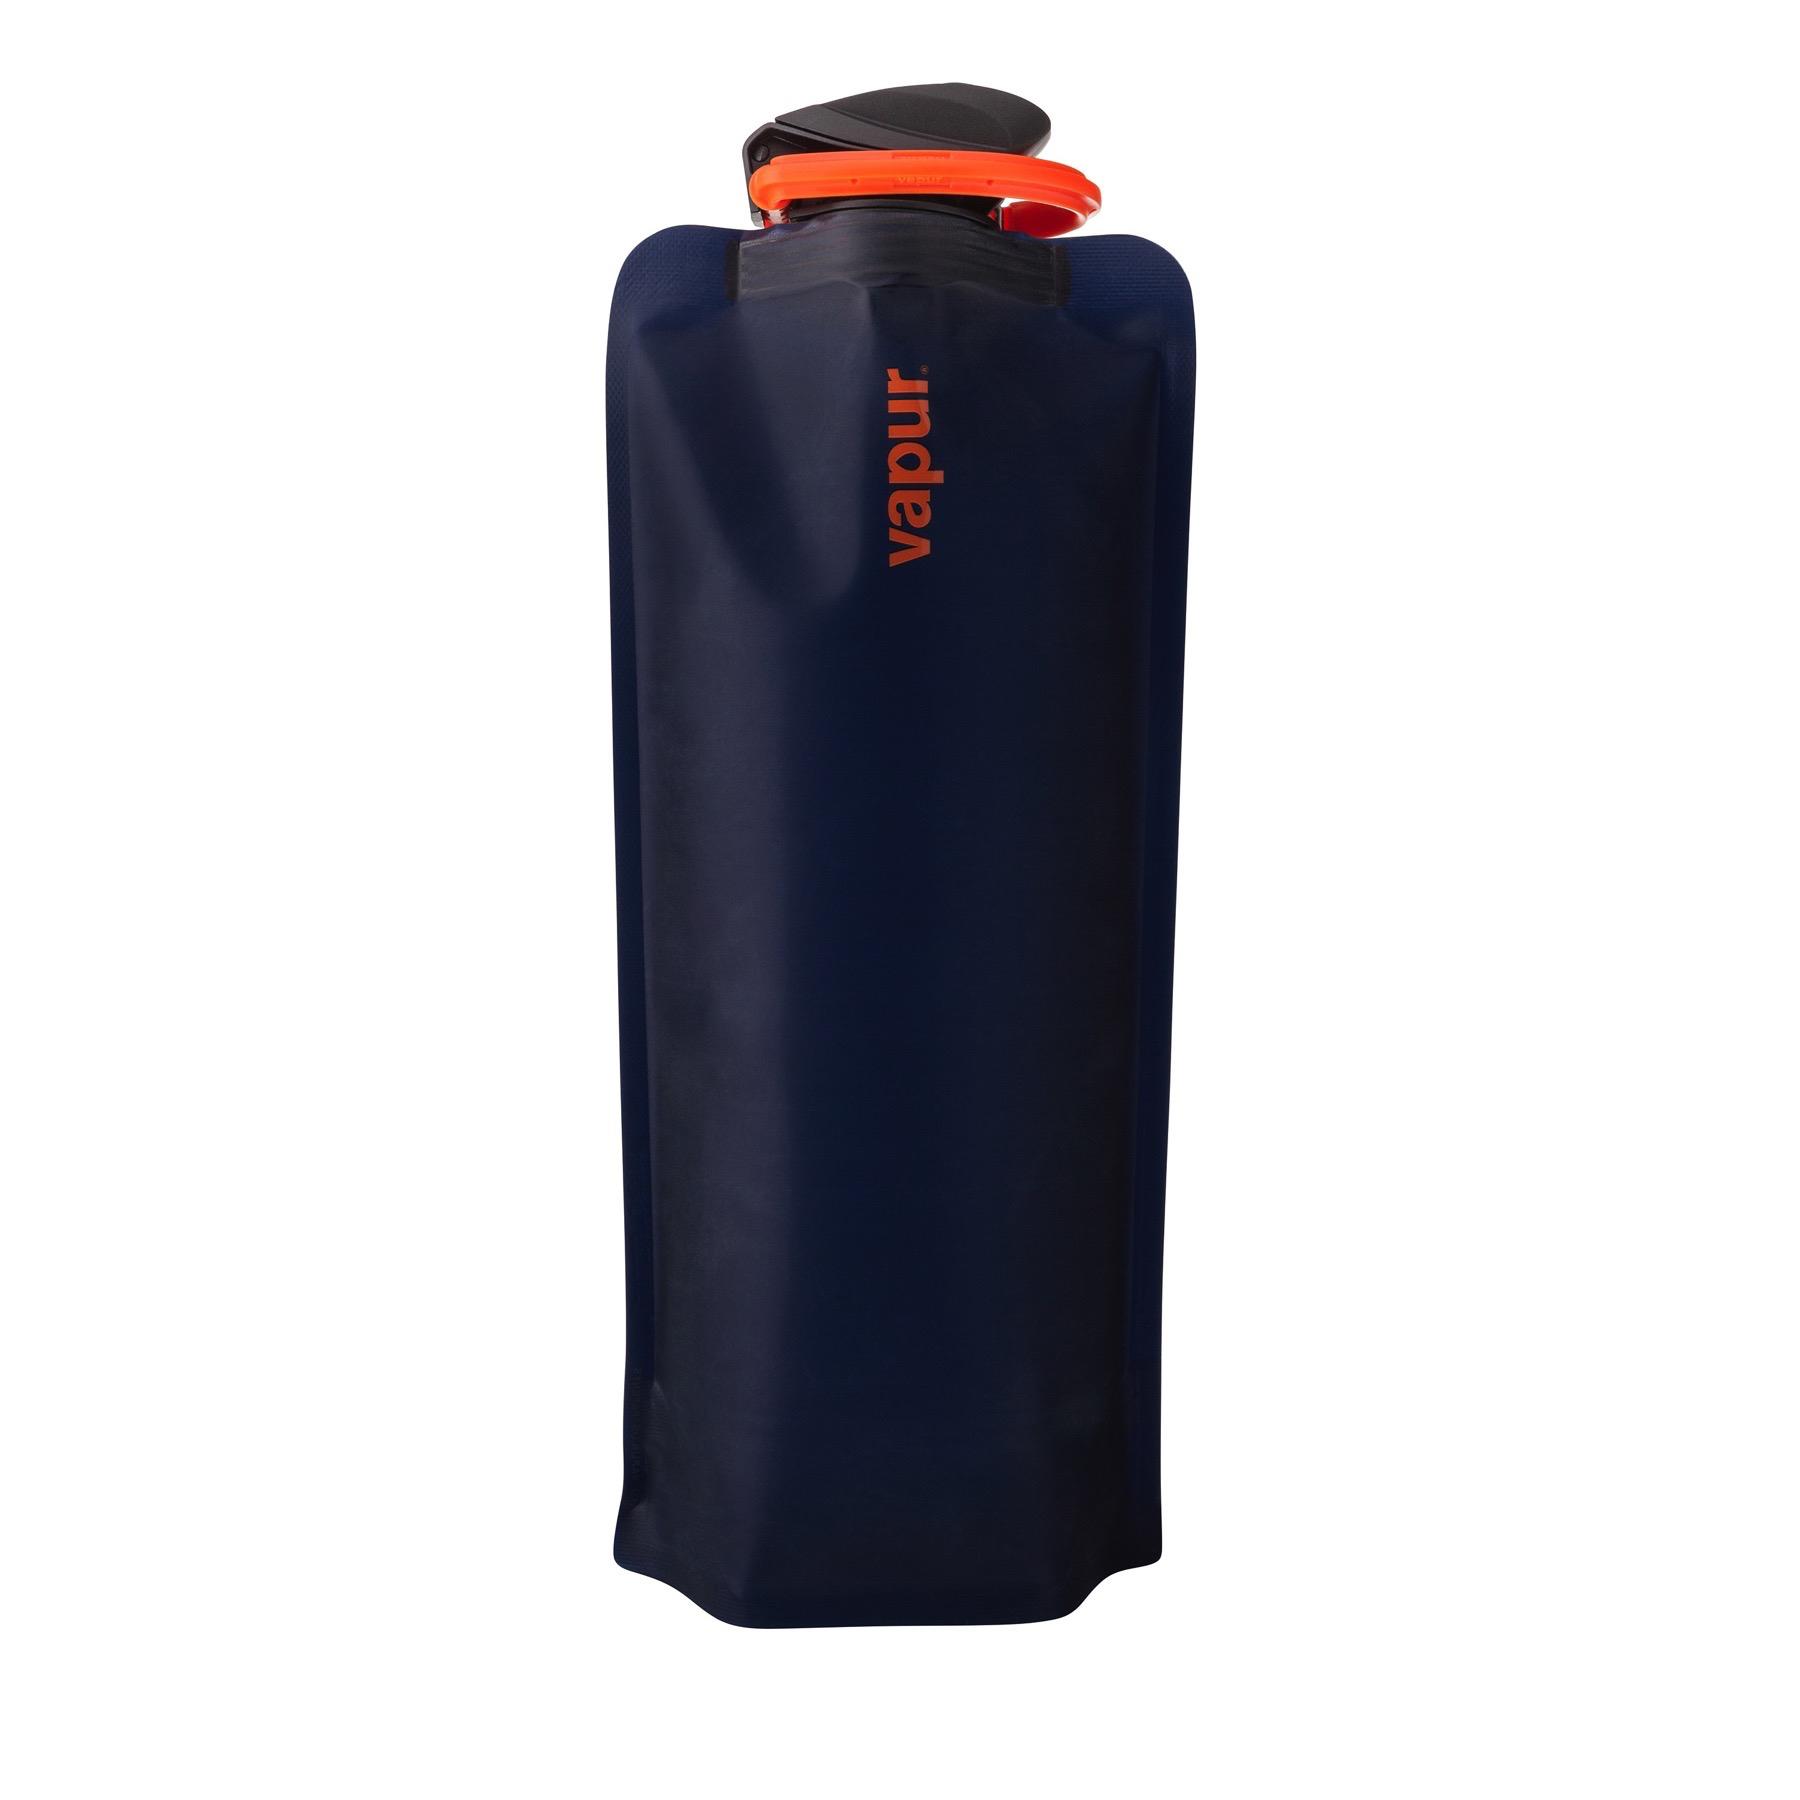 Vapur Eclipse 1 Liter Matte Night Blue Flexible Water Bottle Durable Flask 34oz